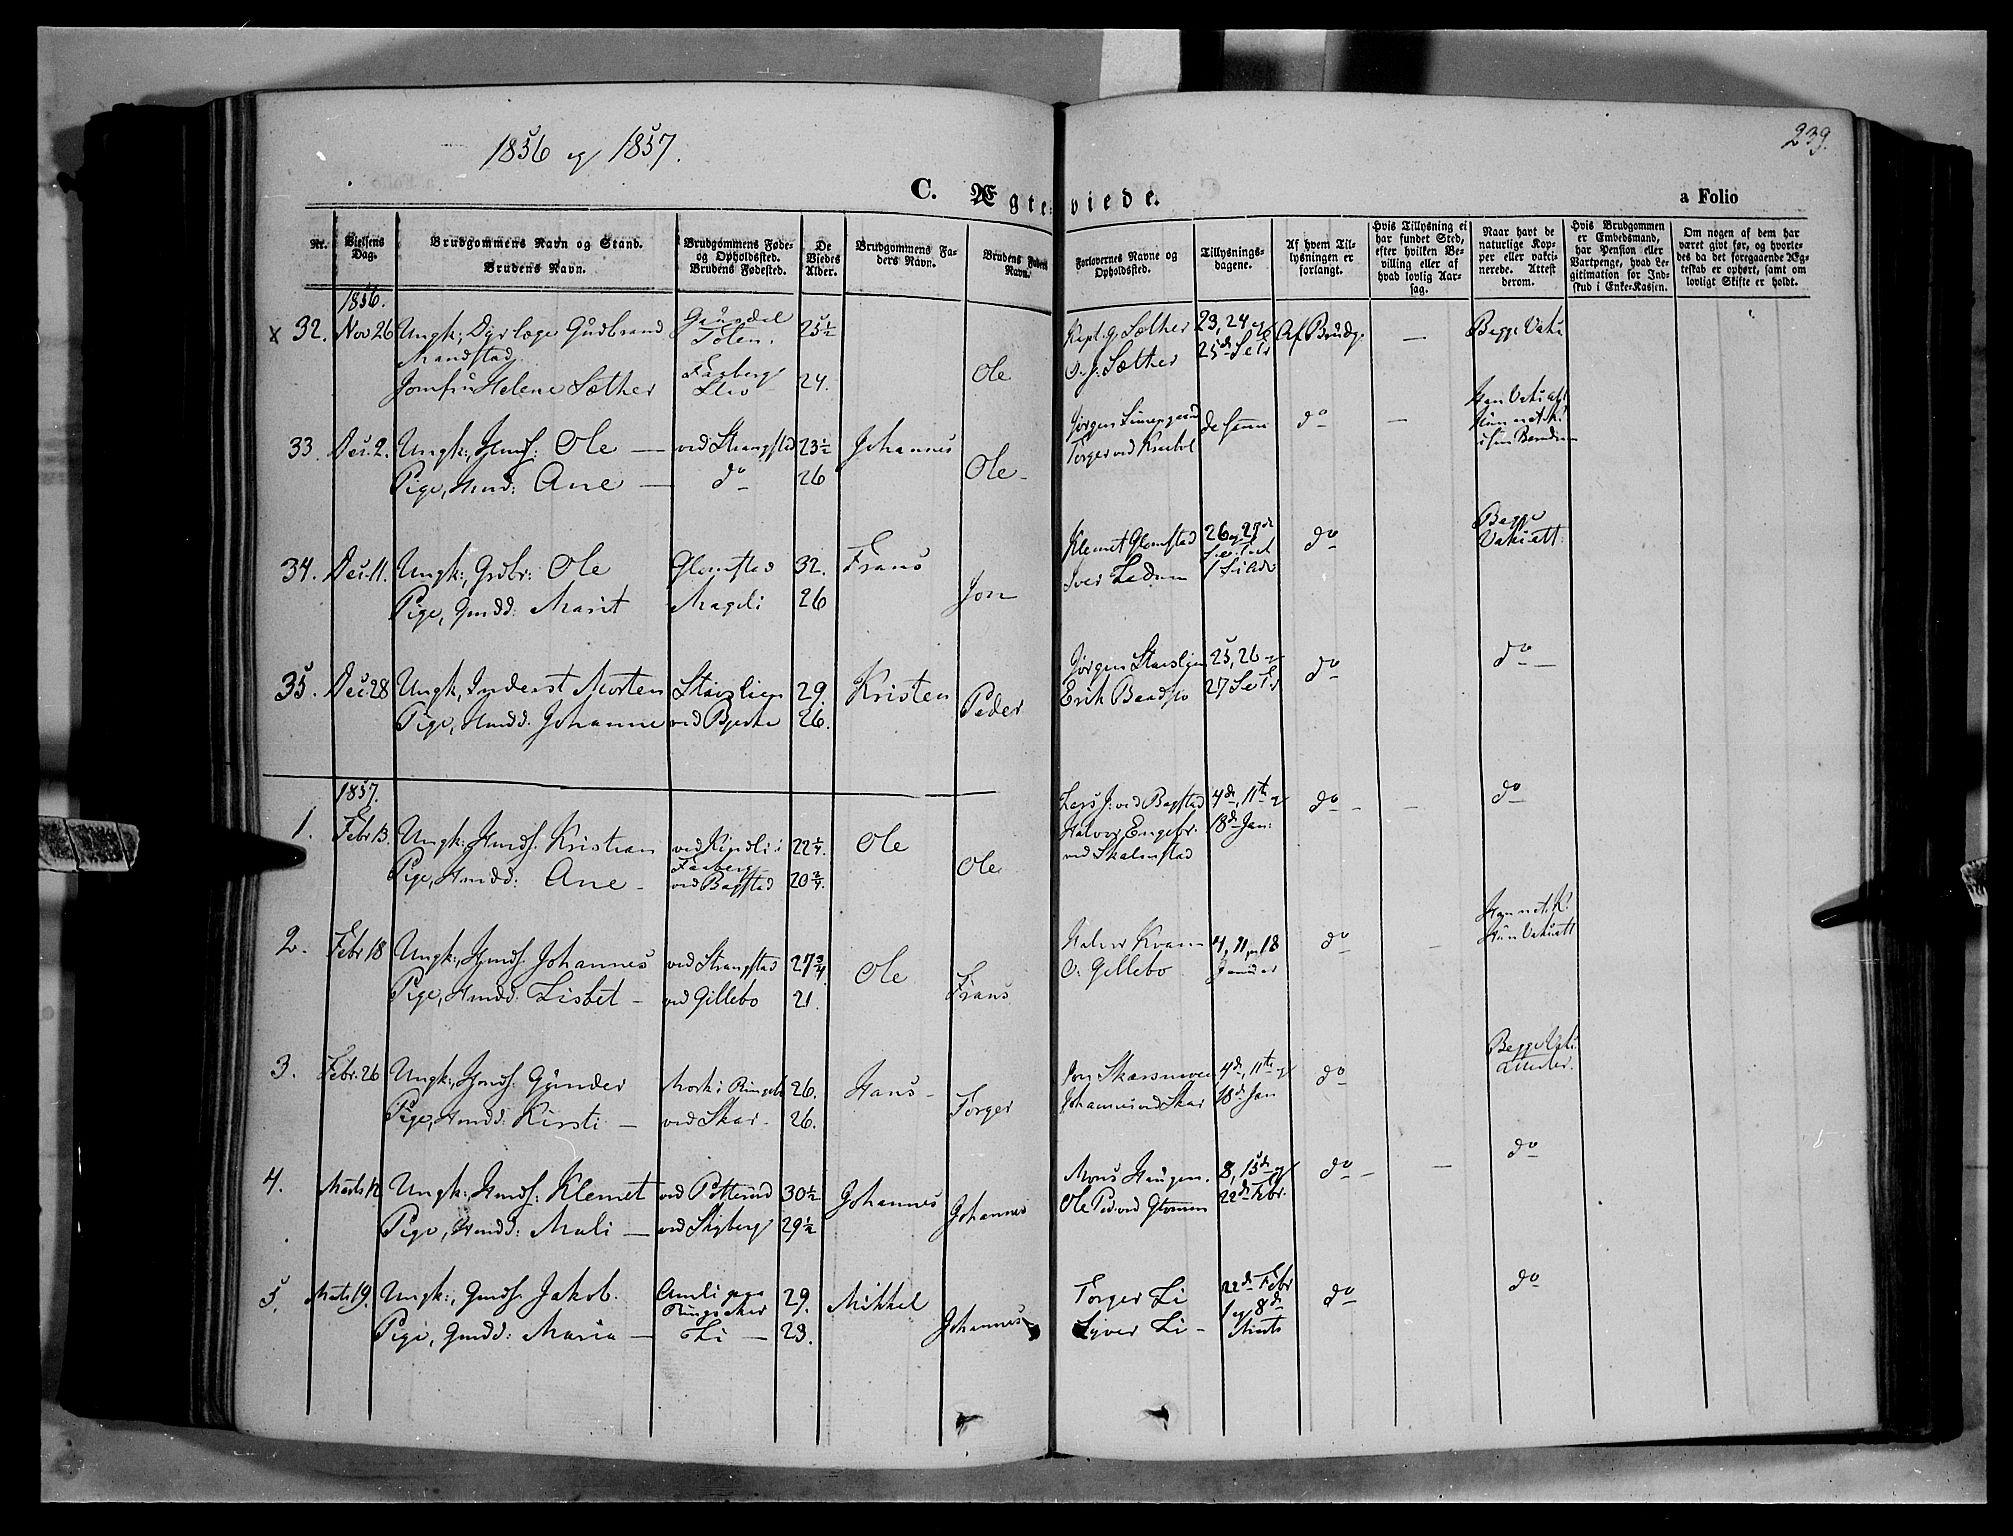 SAH, Øyer prestekontor, Ministerialbok nr. 5, 1842-1857, s. 239